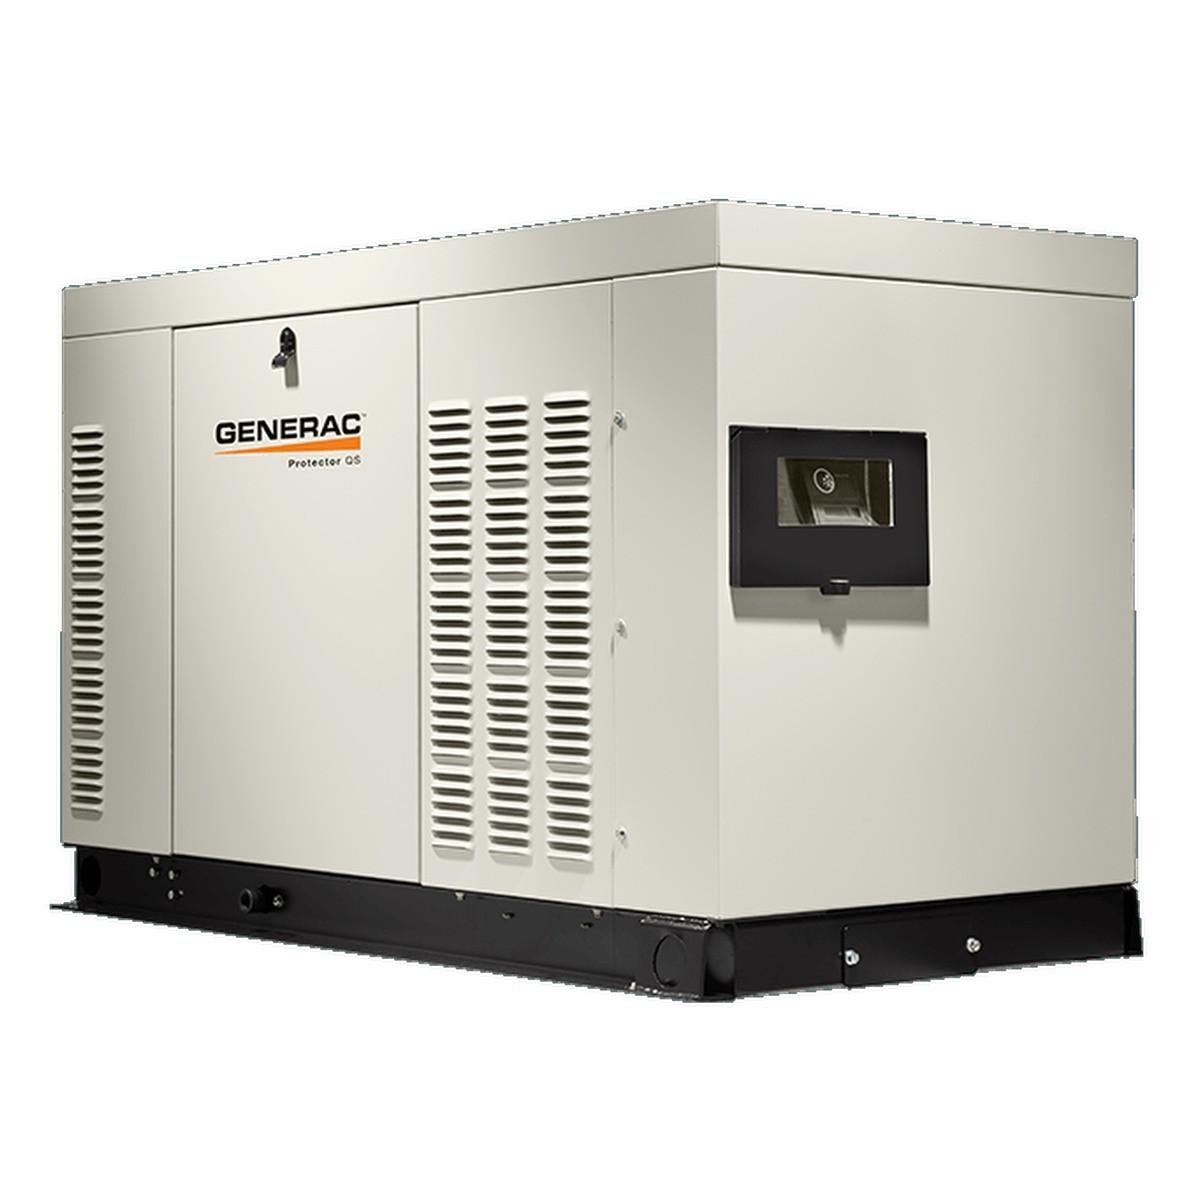 generac protector series rg03015 30kw generator rh apelectric com generac transfer switch wiring diagram generac transfer switch wiring diagram [ 1200 x 1200 Pixel ]